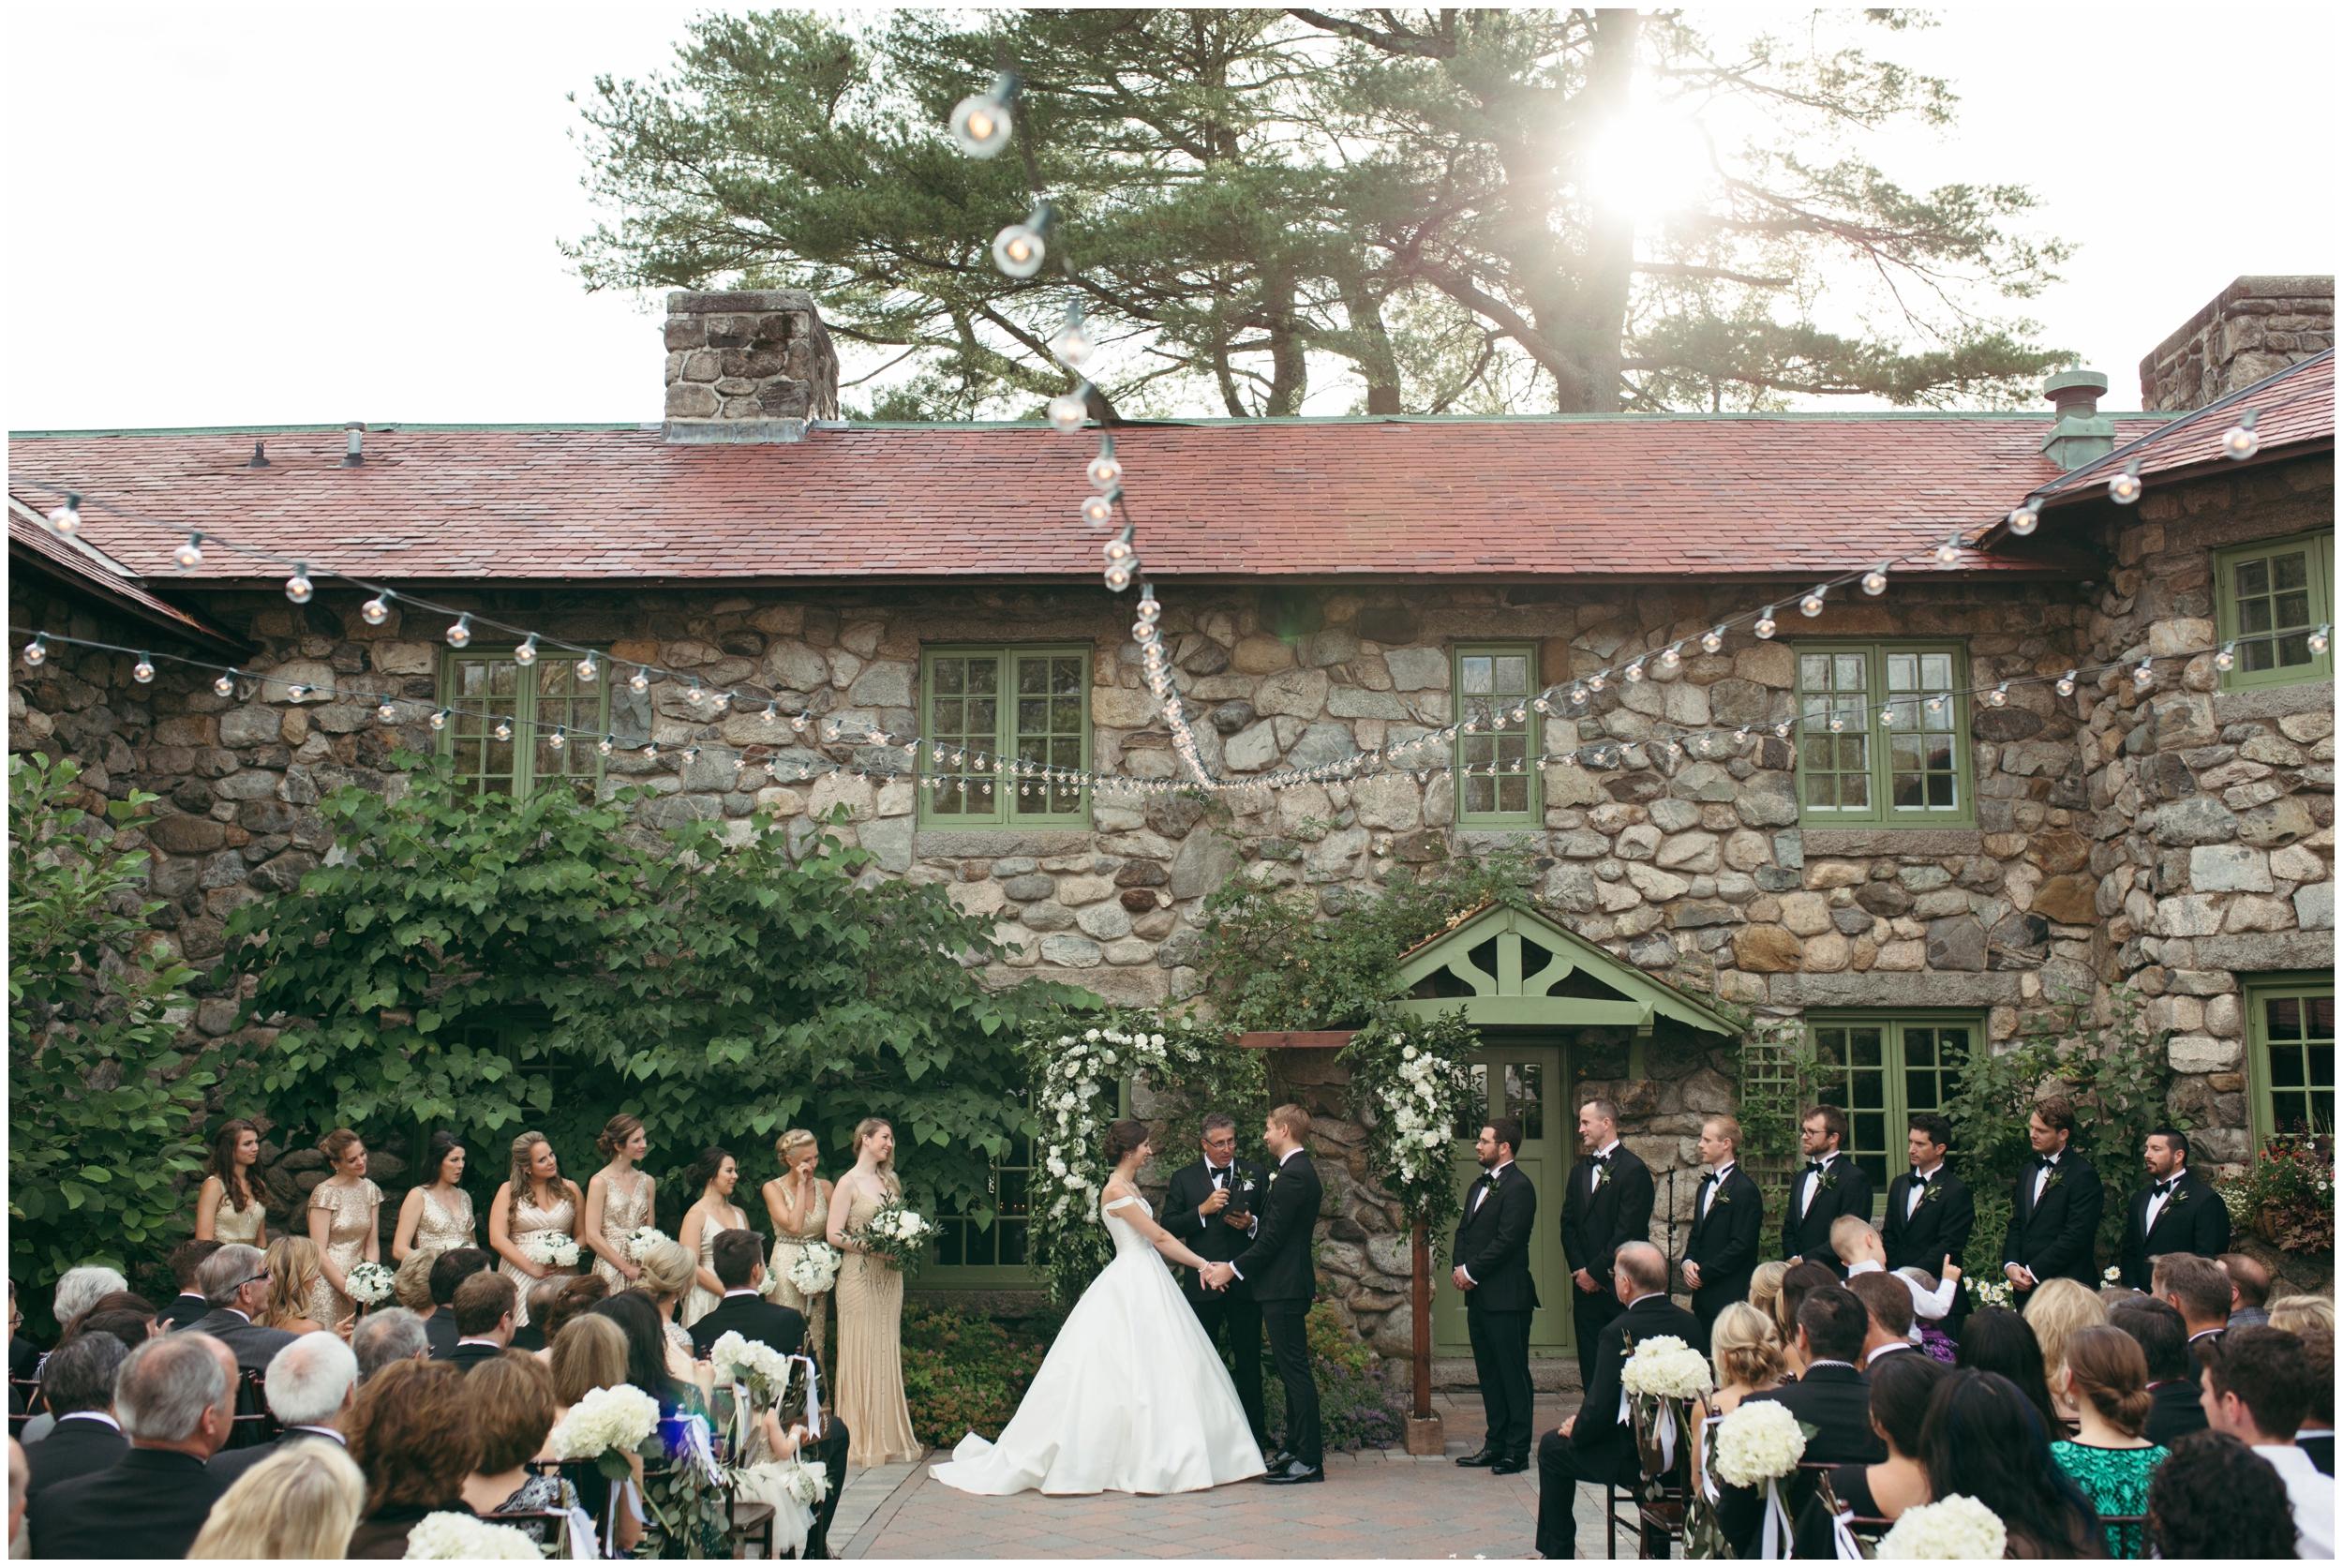 Willowdale-Estate-Wedding-Bailey-Q-Photo-Boston-Wedding-Photographer-043.JPG